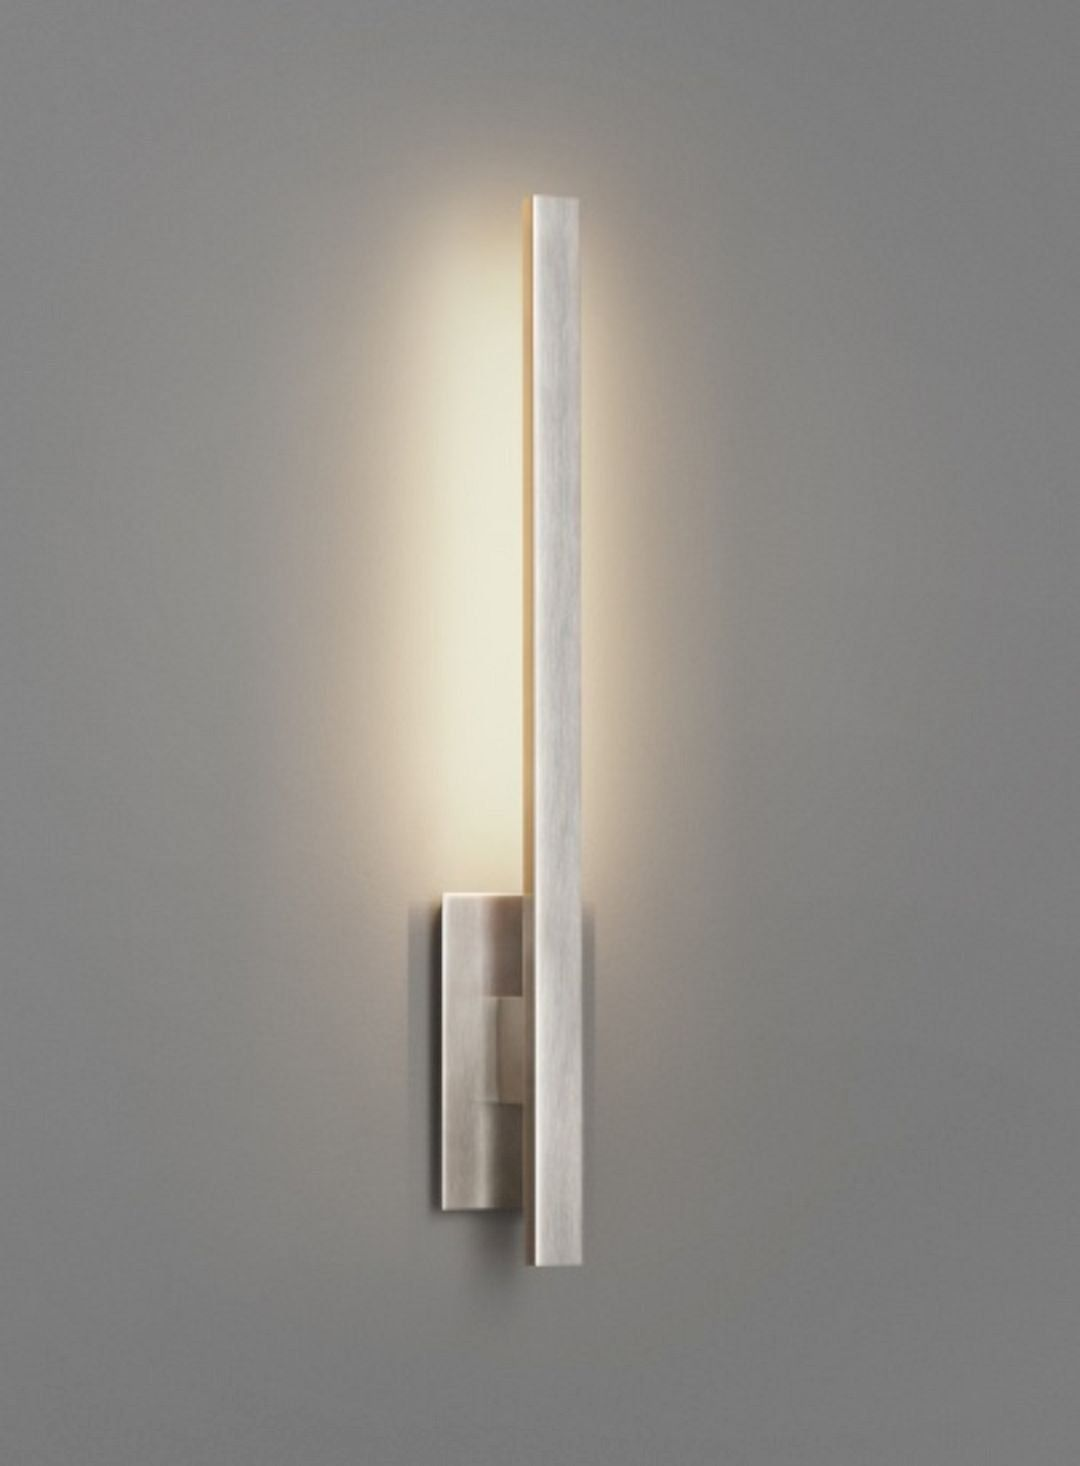 Most beautiful wall lamp designs httpsdesignlisticlewall most beautiful wall lamp designs httpsdesignlisticlewall aloadofball Choice Image